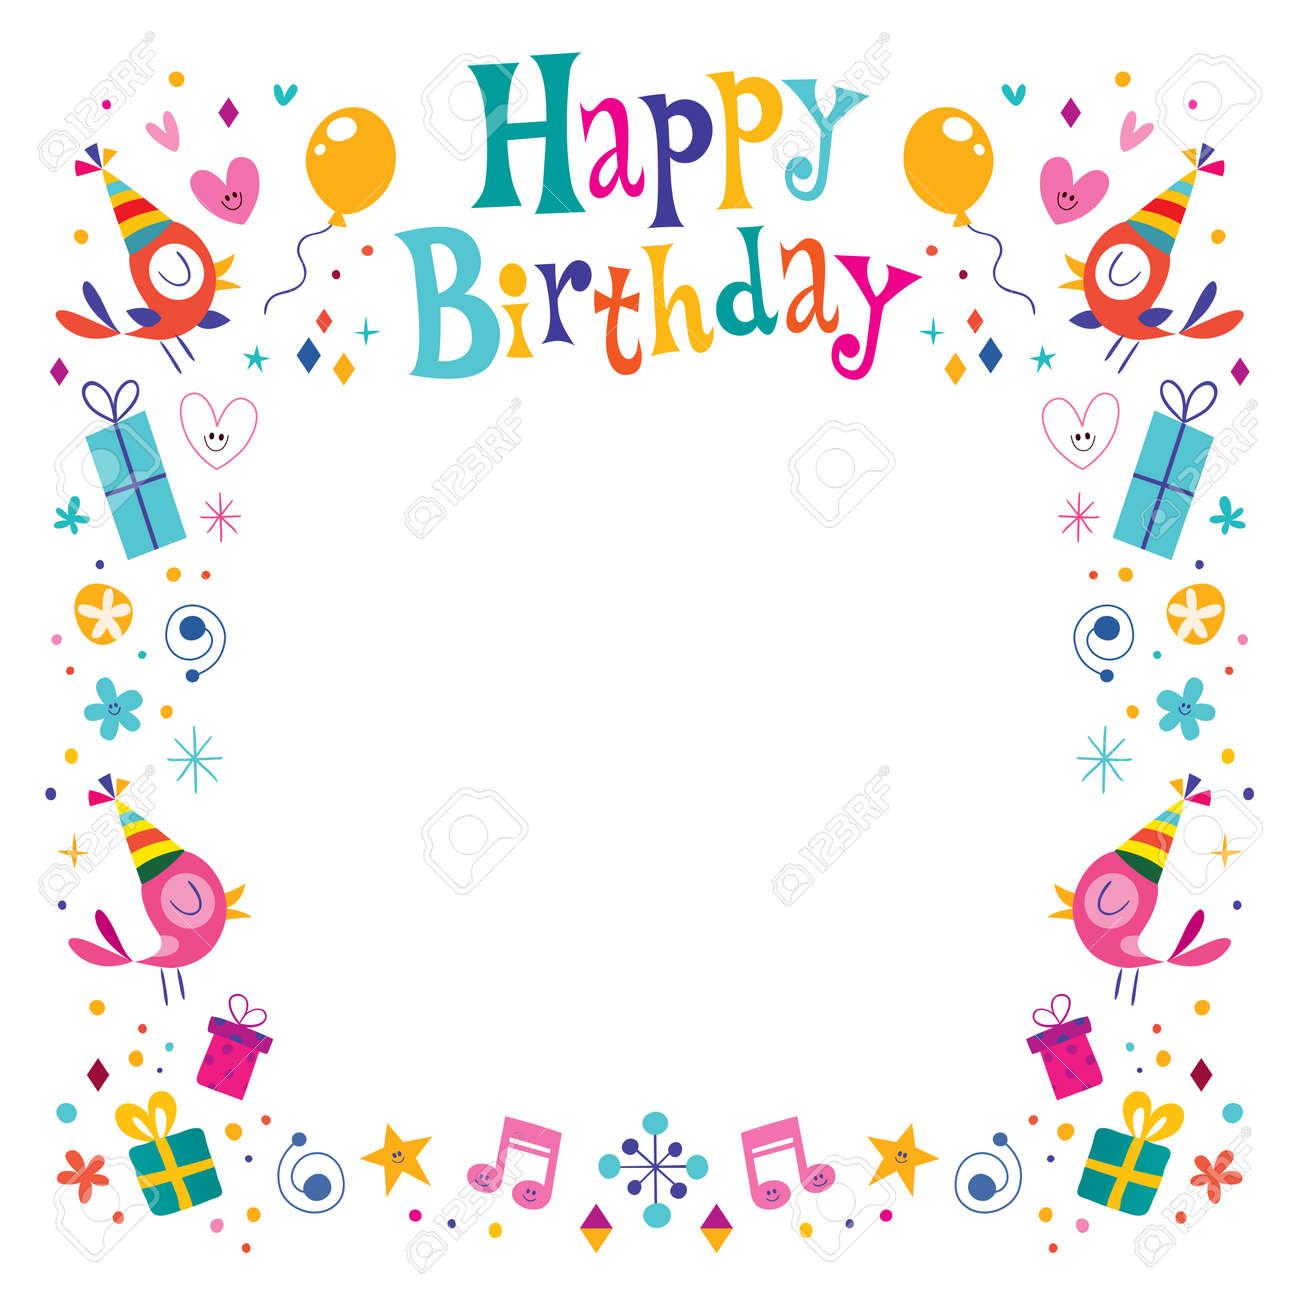 Happy Birthday Decorative Border Frame Royalty Free Cliparts ...